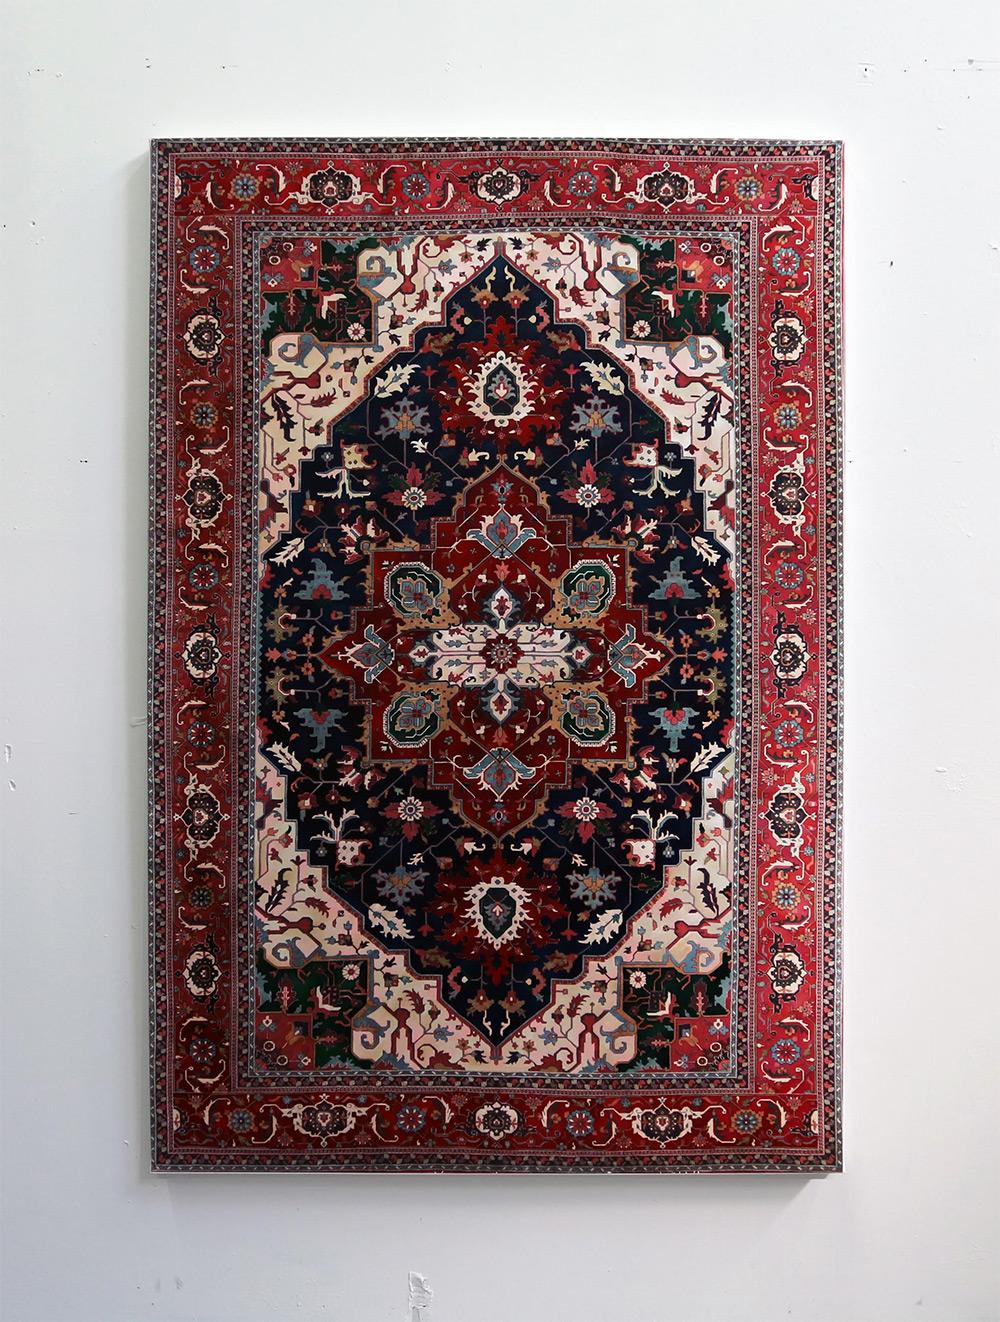 tappeti-persiani-dipinti-a-mano-jason-seife-6